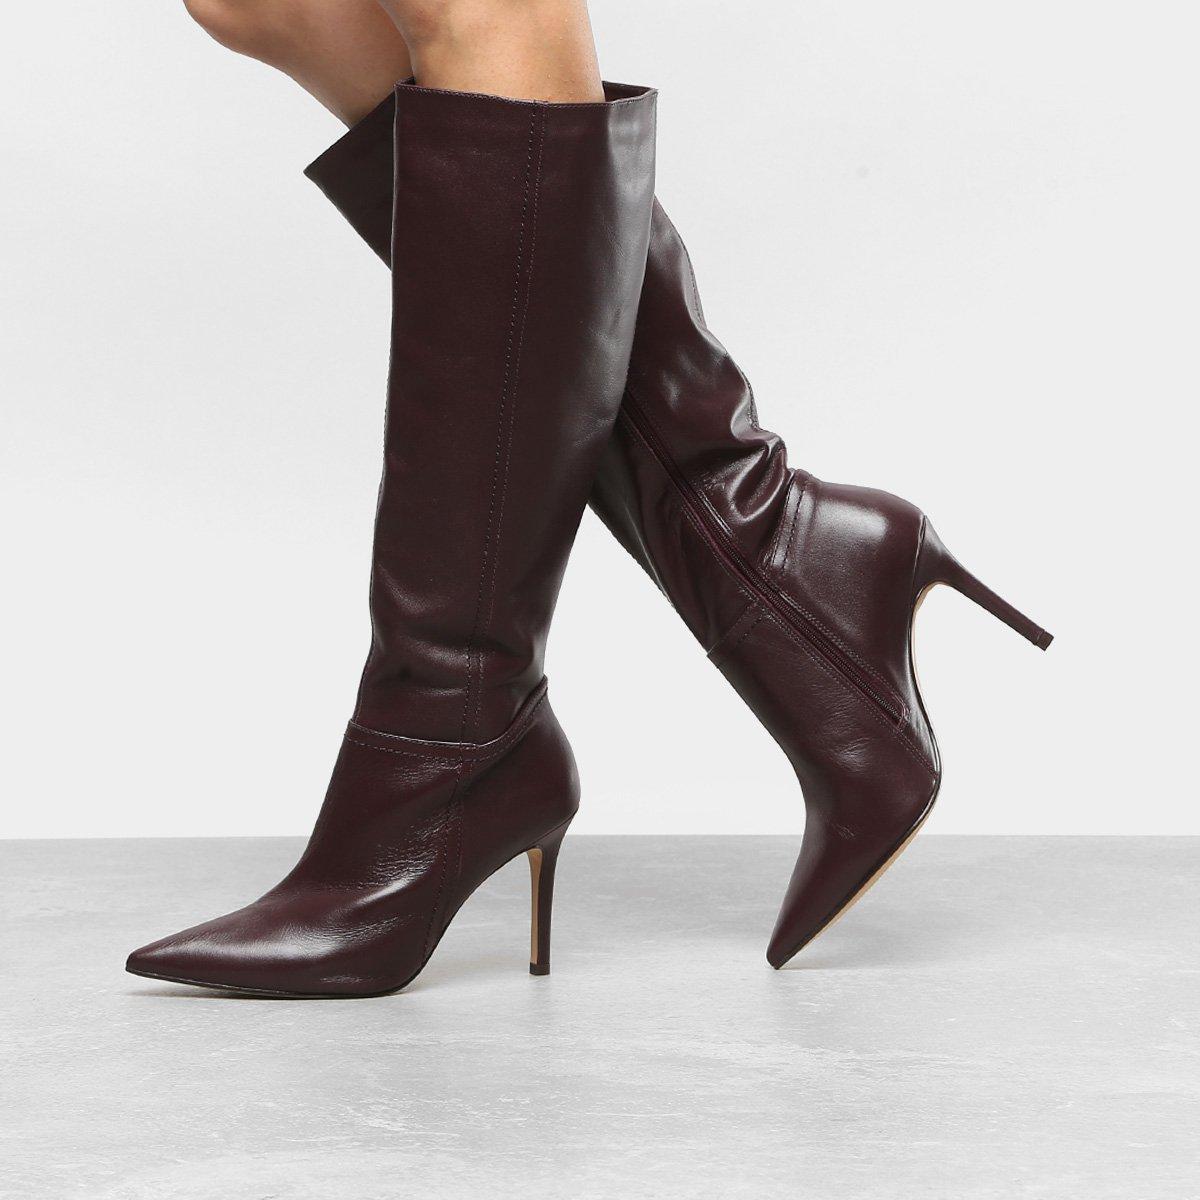 8e019f2b80 Bota Couro Cano Longo Shoestock Salto Fino Feminina - Vinho | Shoestock